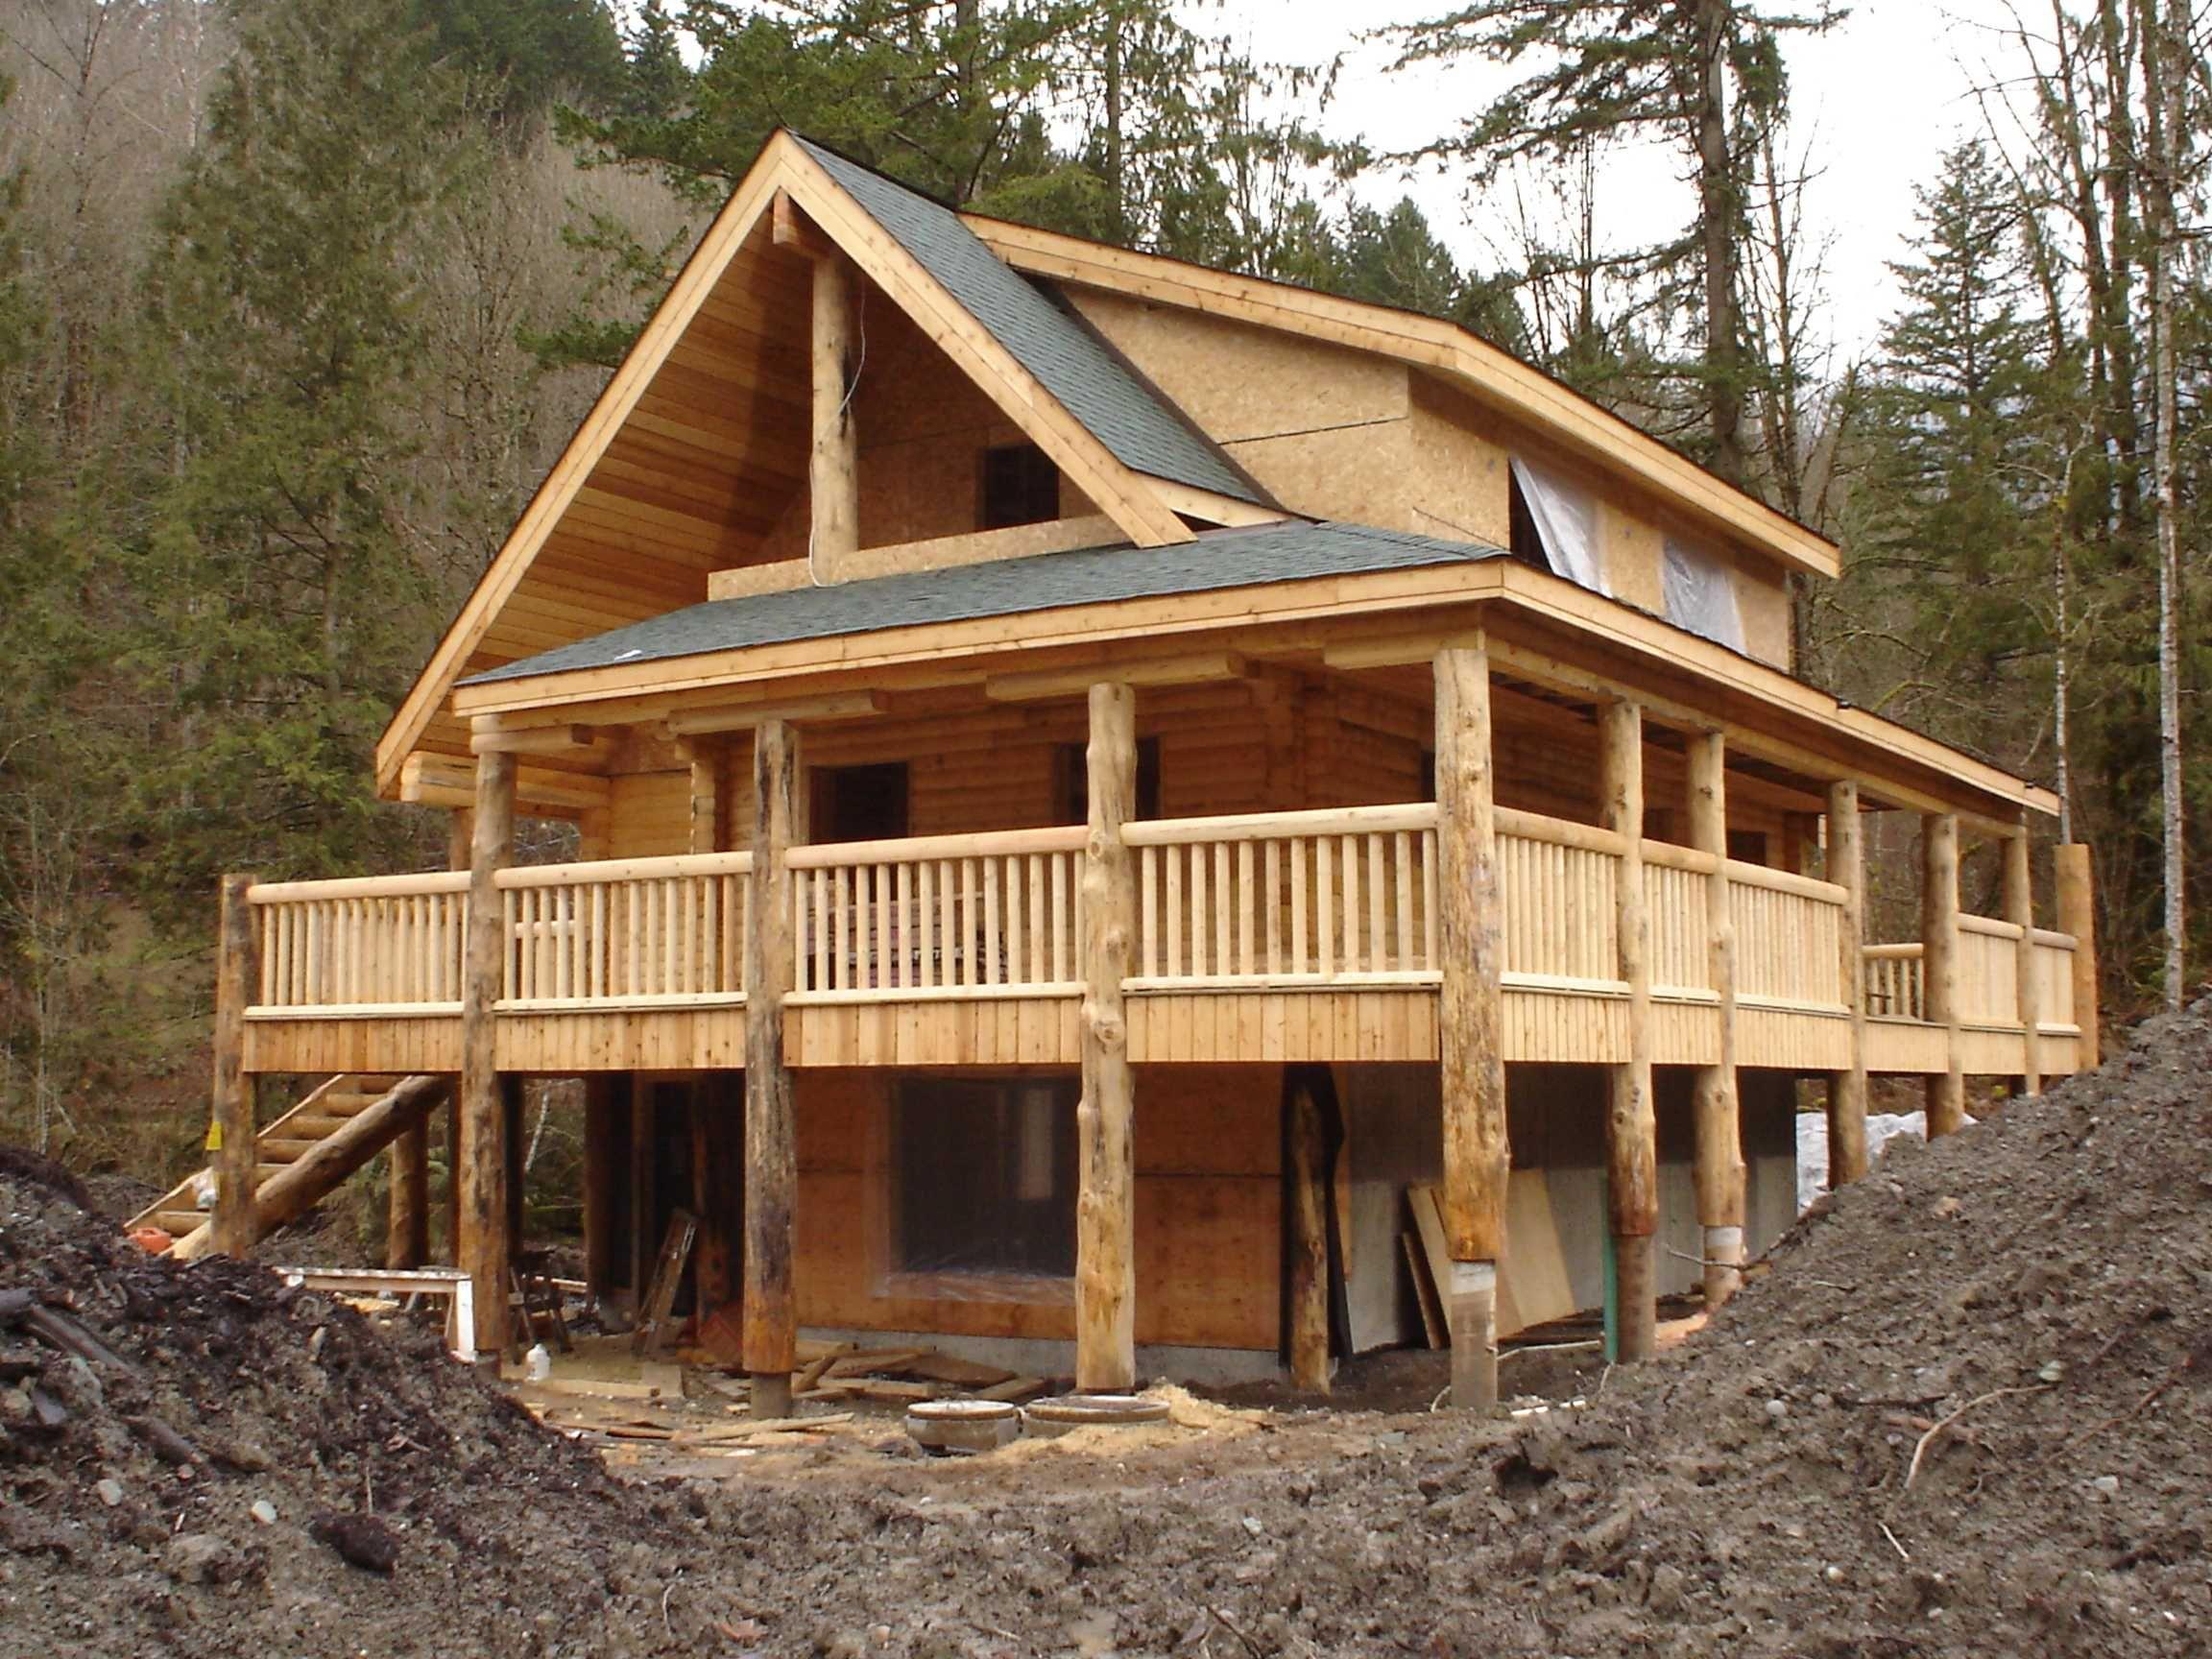 Log Dormer Construction Slideshow Of Machined Log Home Construction Home Construction Log Homes Log Cabin Homes